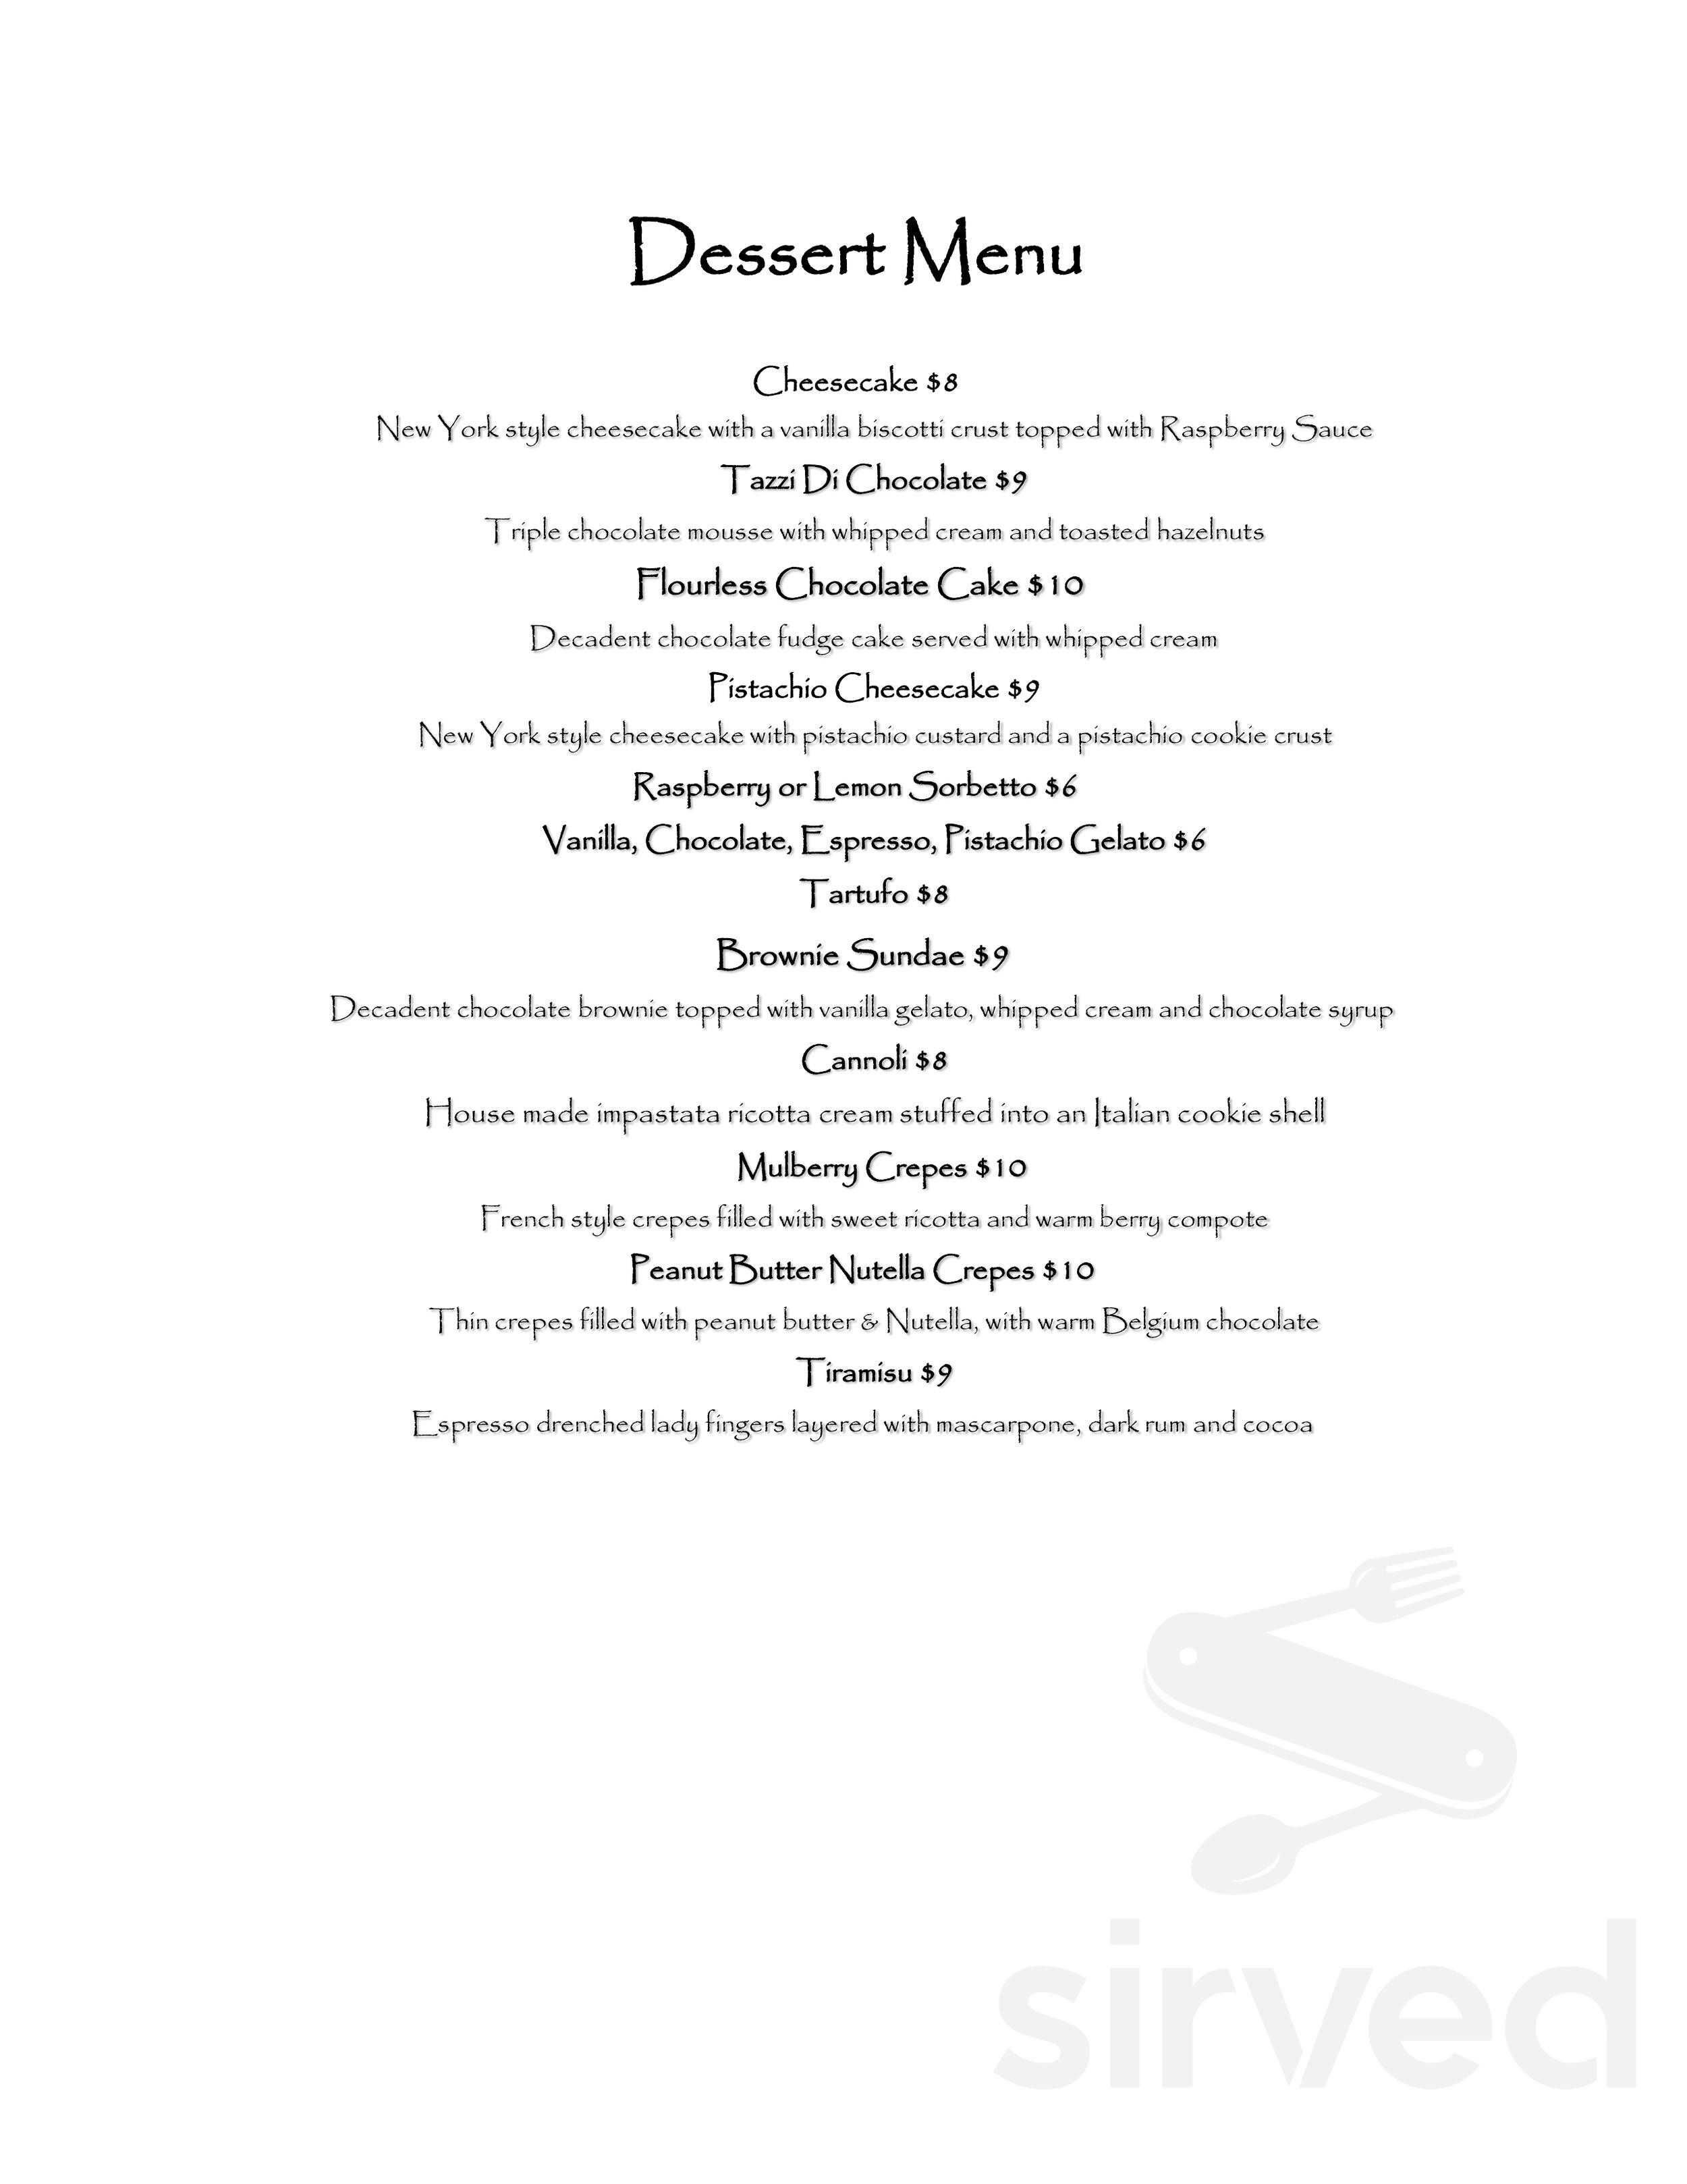 Menu For Mulberry Street Restaurant In Woodbridge New Jersey